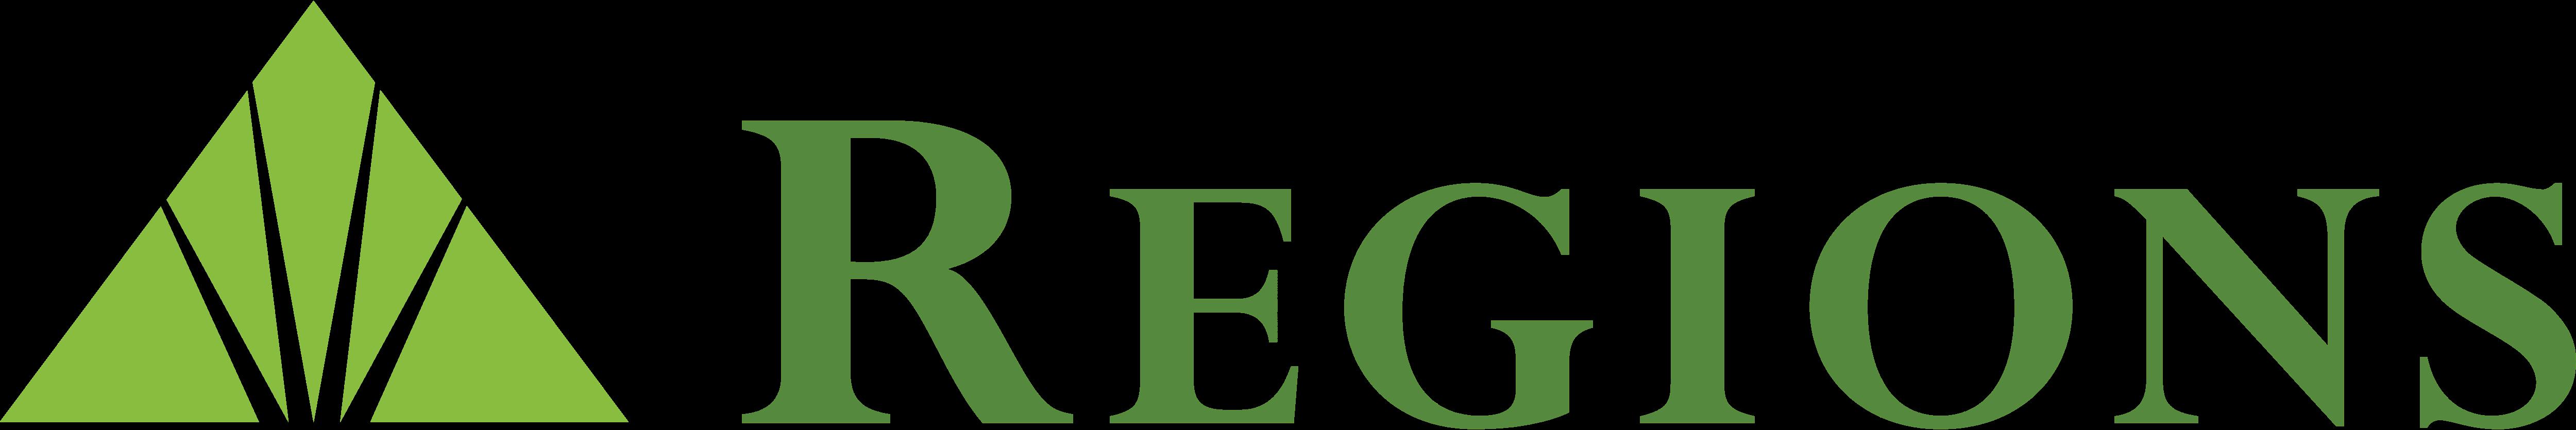 https://www.jadallas.org/wp-content/uploads/2021/09/Regions_Bank_logo.png